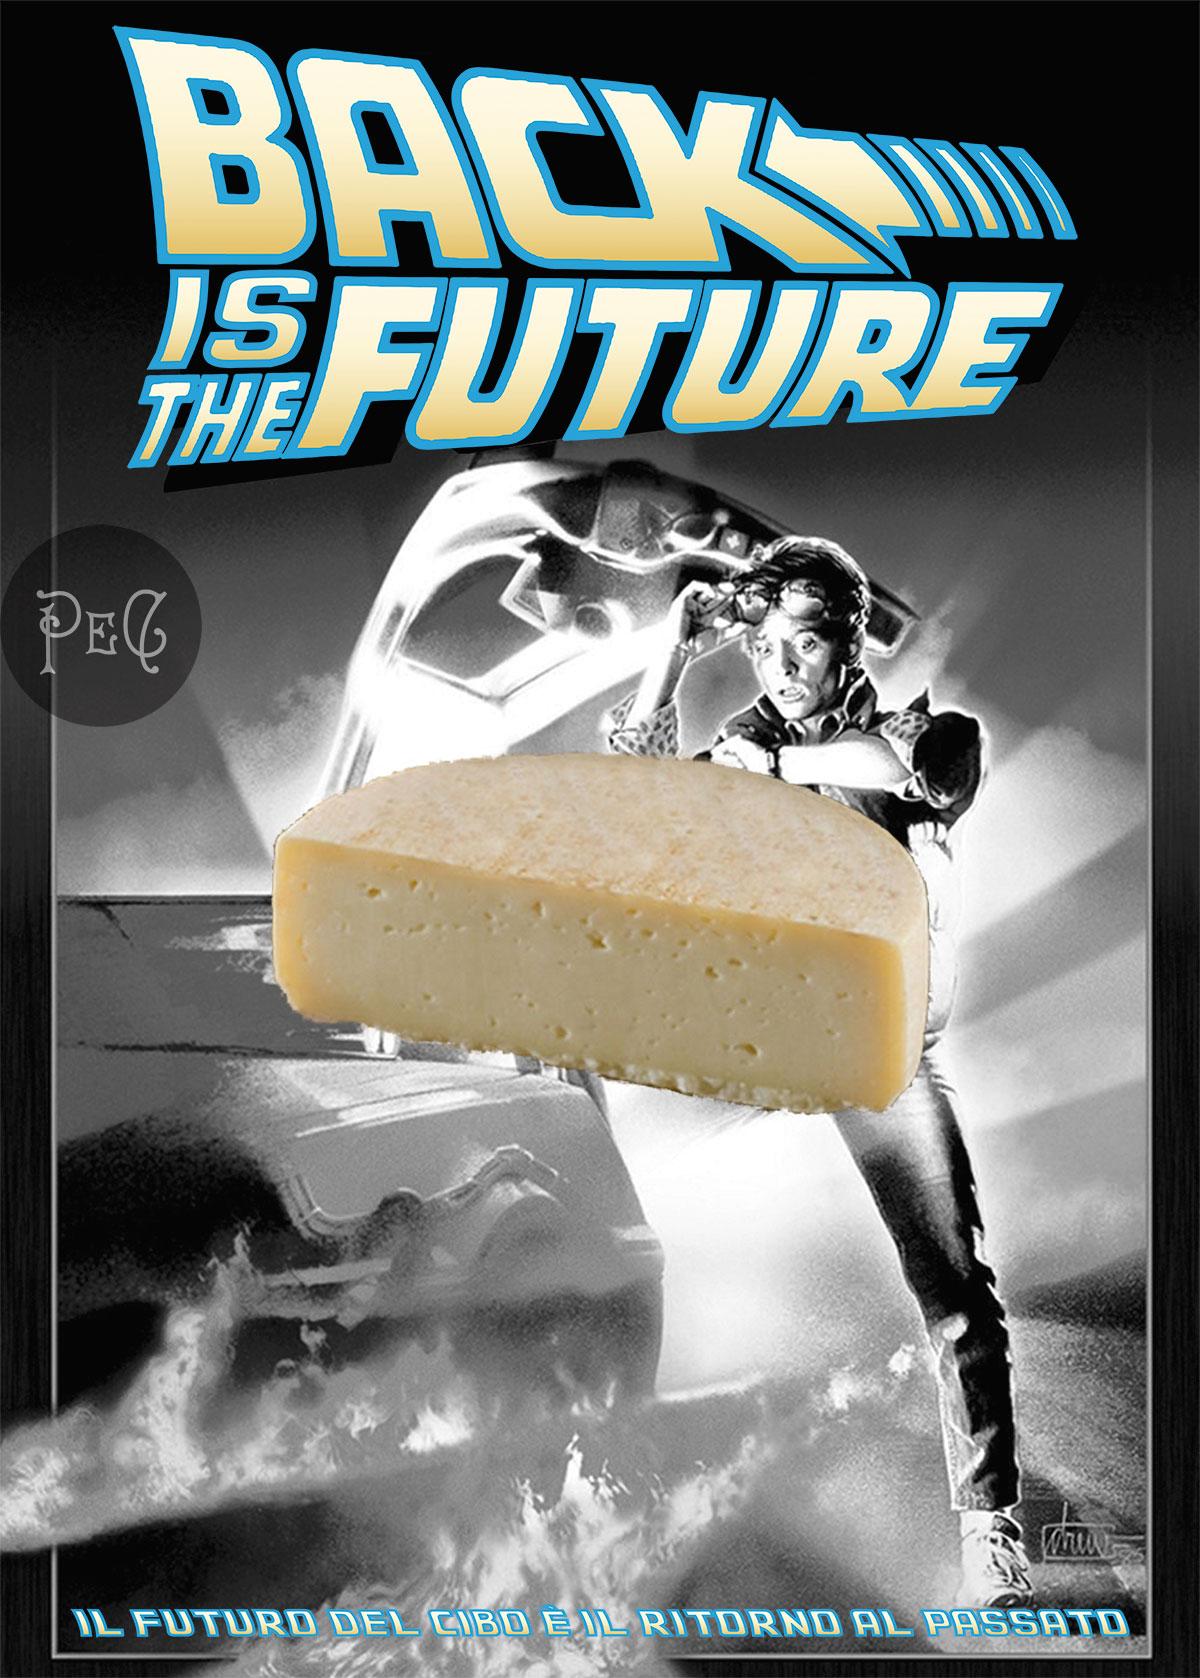 BITF formaggio latte crudo Cesen